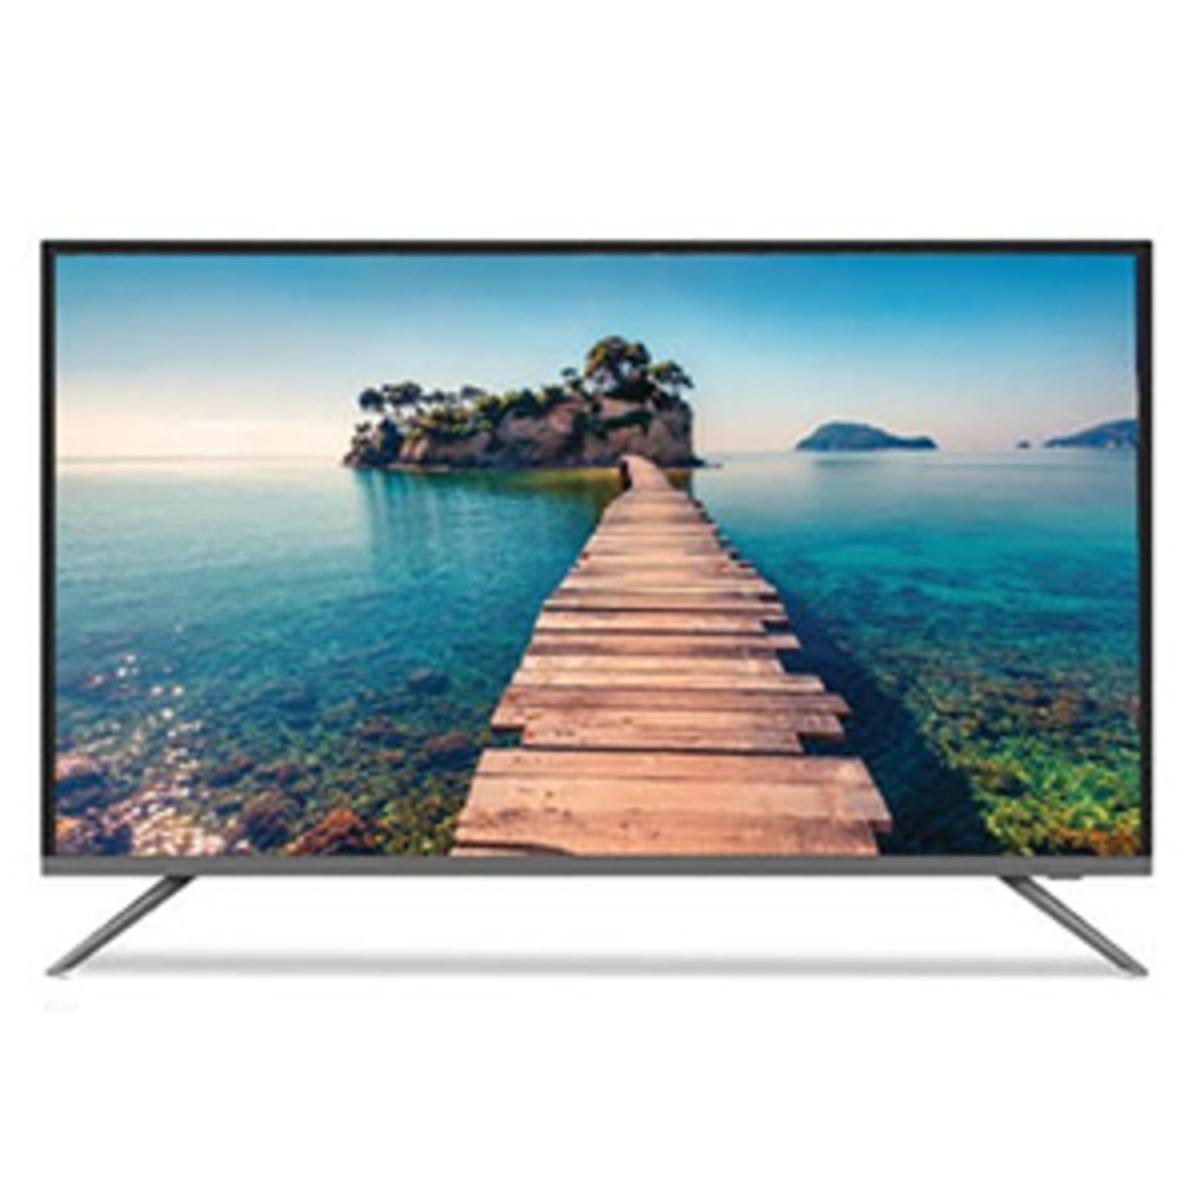 Buy Ikon 4K Ultra HD Smart Android LED TV IKE55EKS 55inch